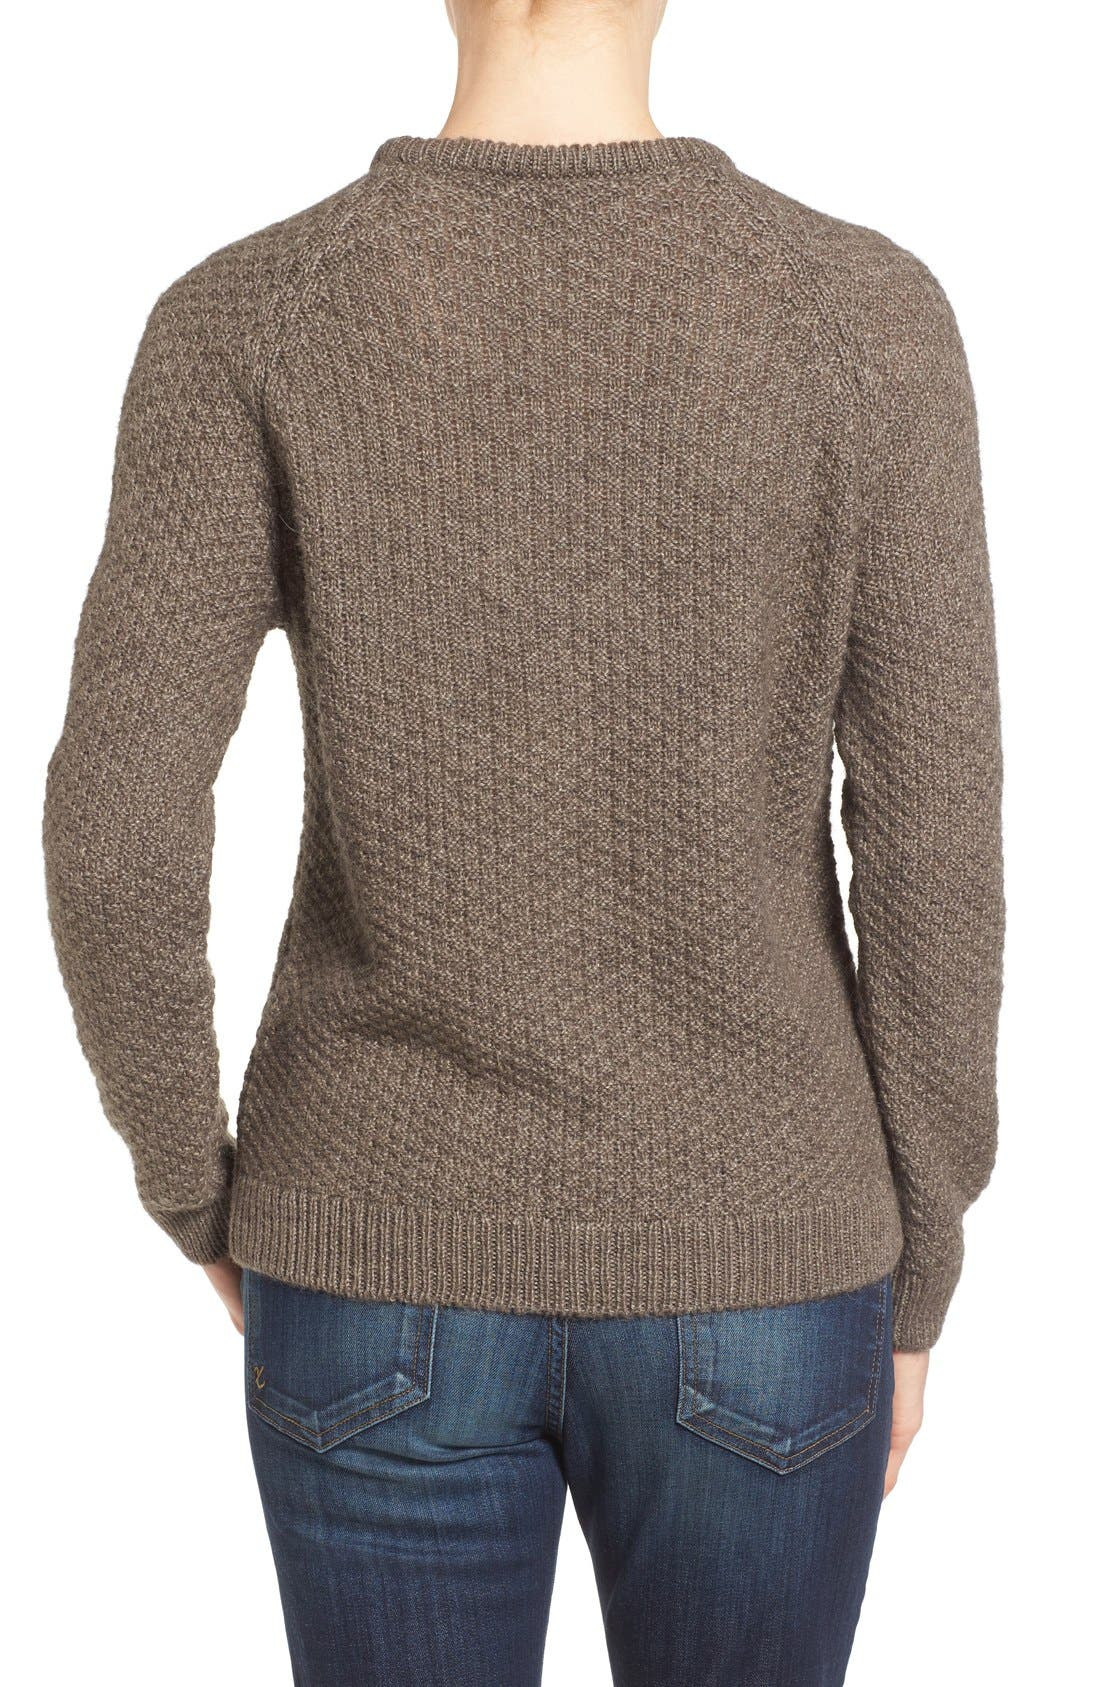 Cable Knit Crewneck Sweater,                             Alternate thumbnail 6, color,                             270